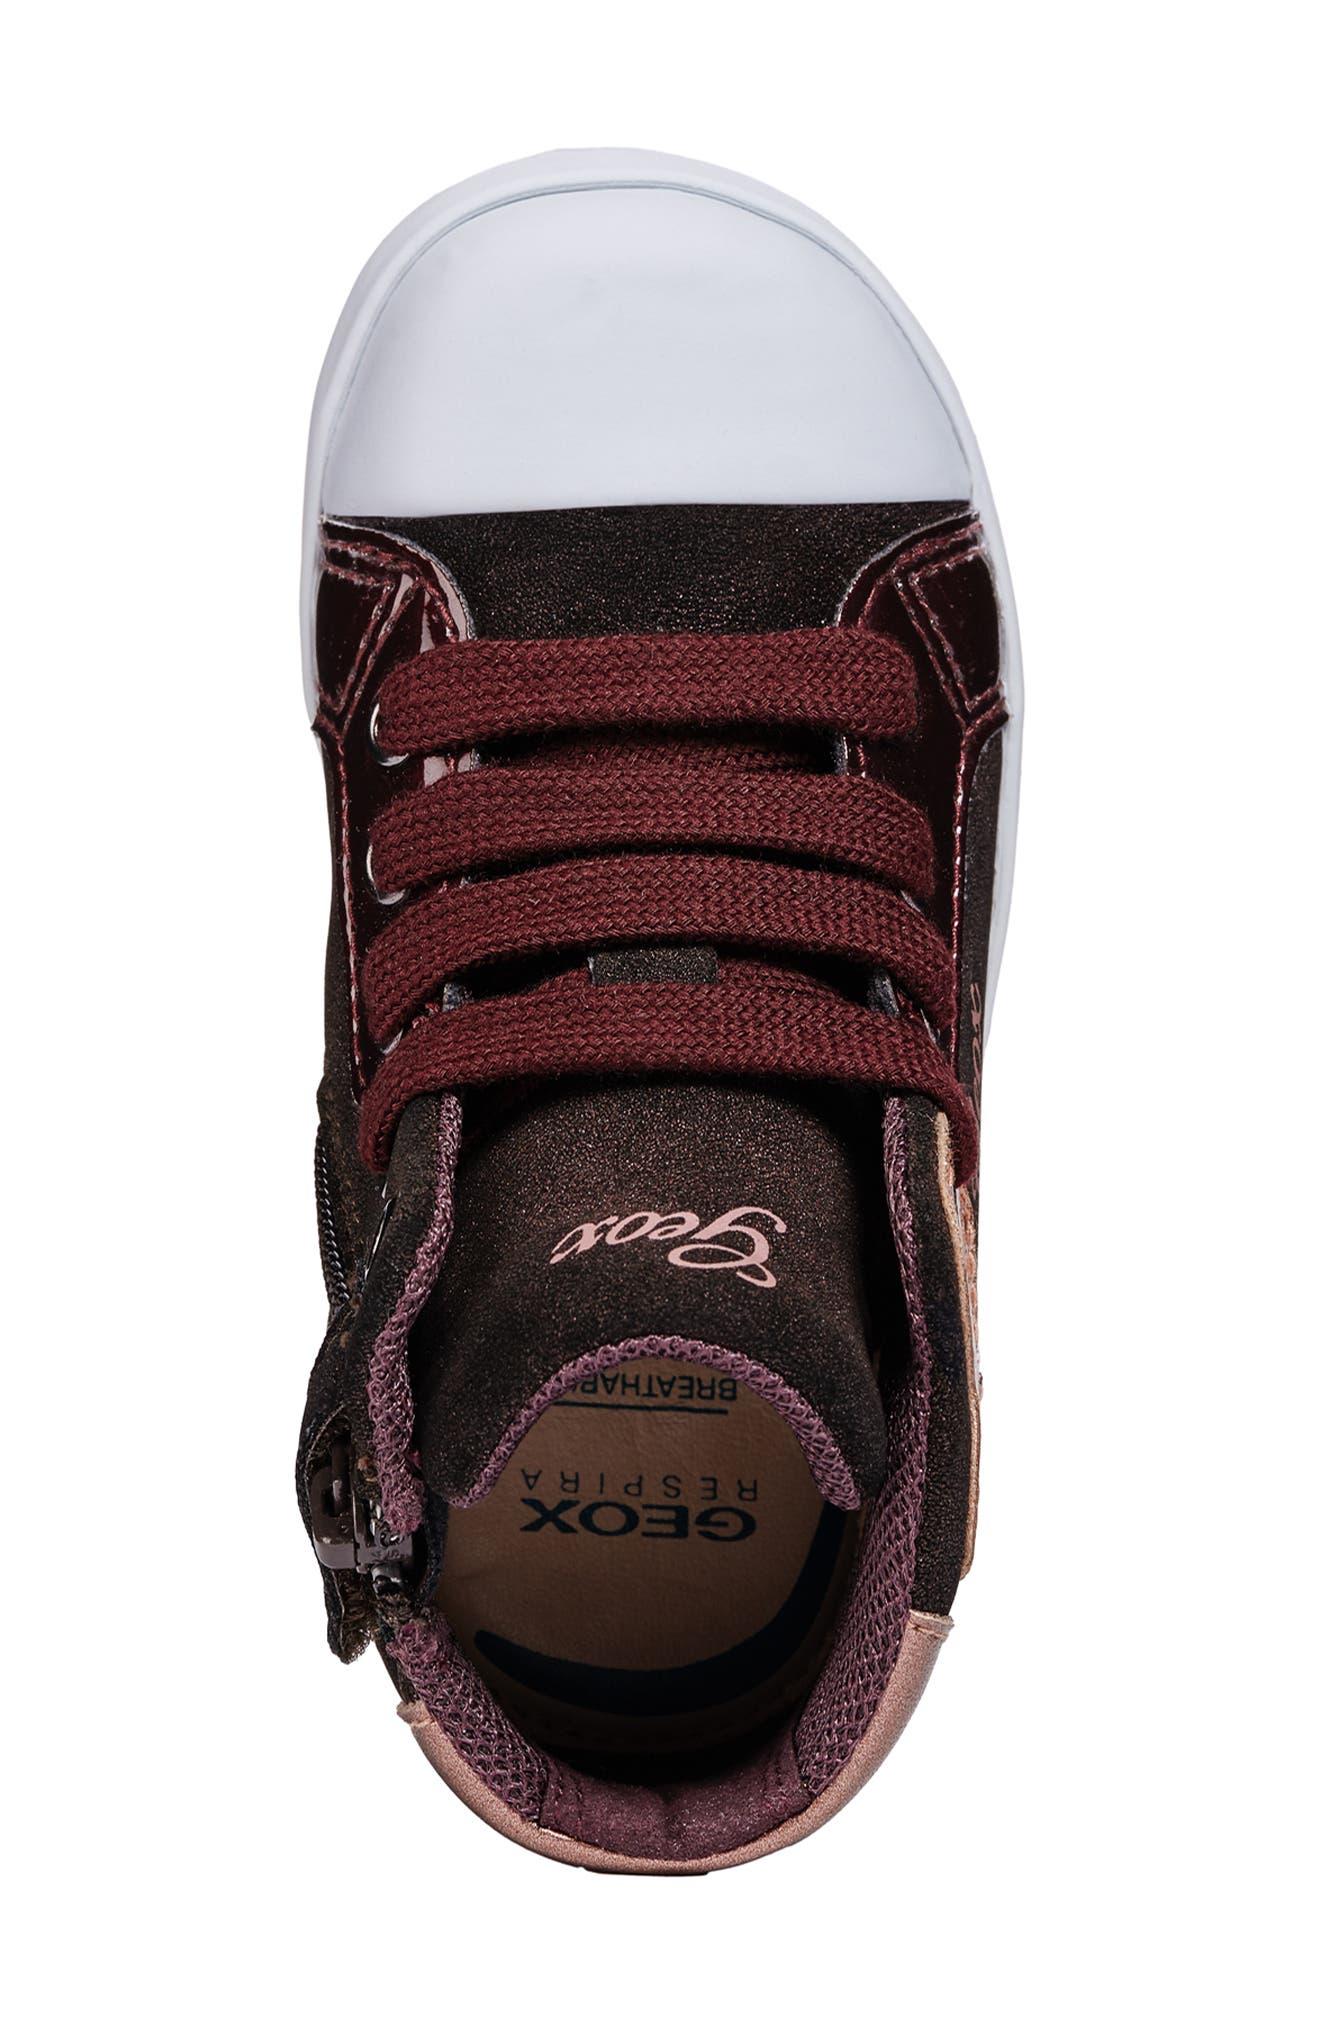 Kilwi Sparkle High Top Sneaker,                             Alternate thumbnail 4, color,                             DARK BURGUNDY